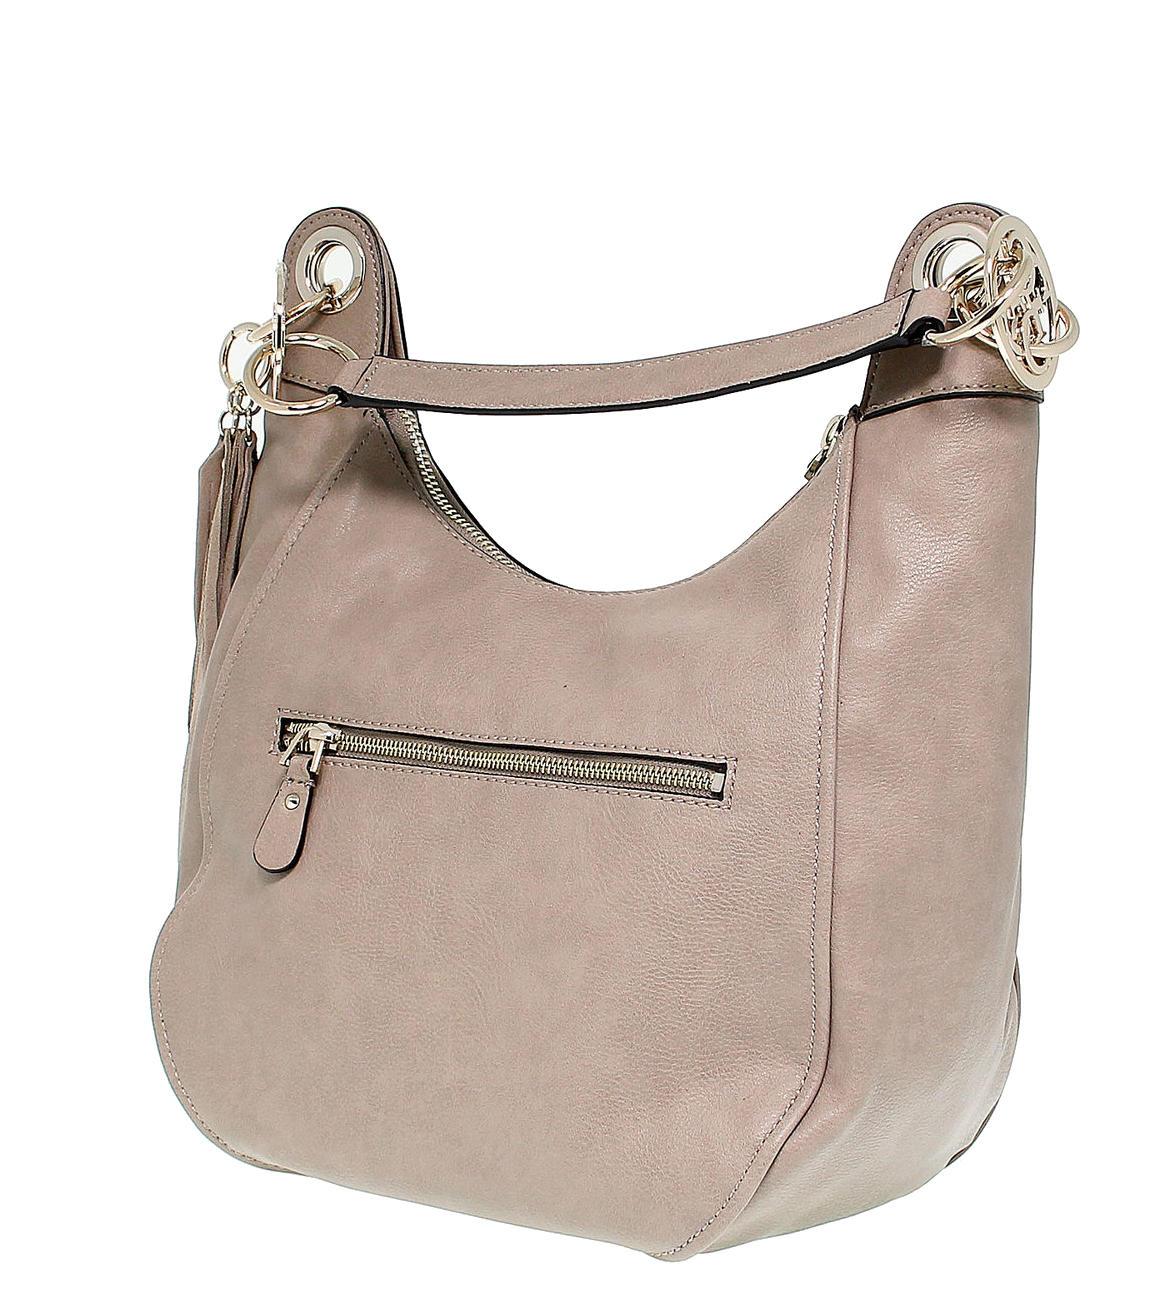 e99138b46a Guess Alana Shoulder Bag Rope - Shop Online At Best Prices!